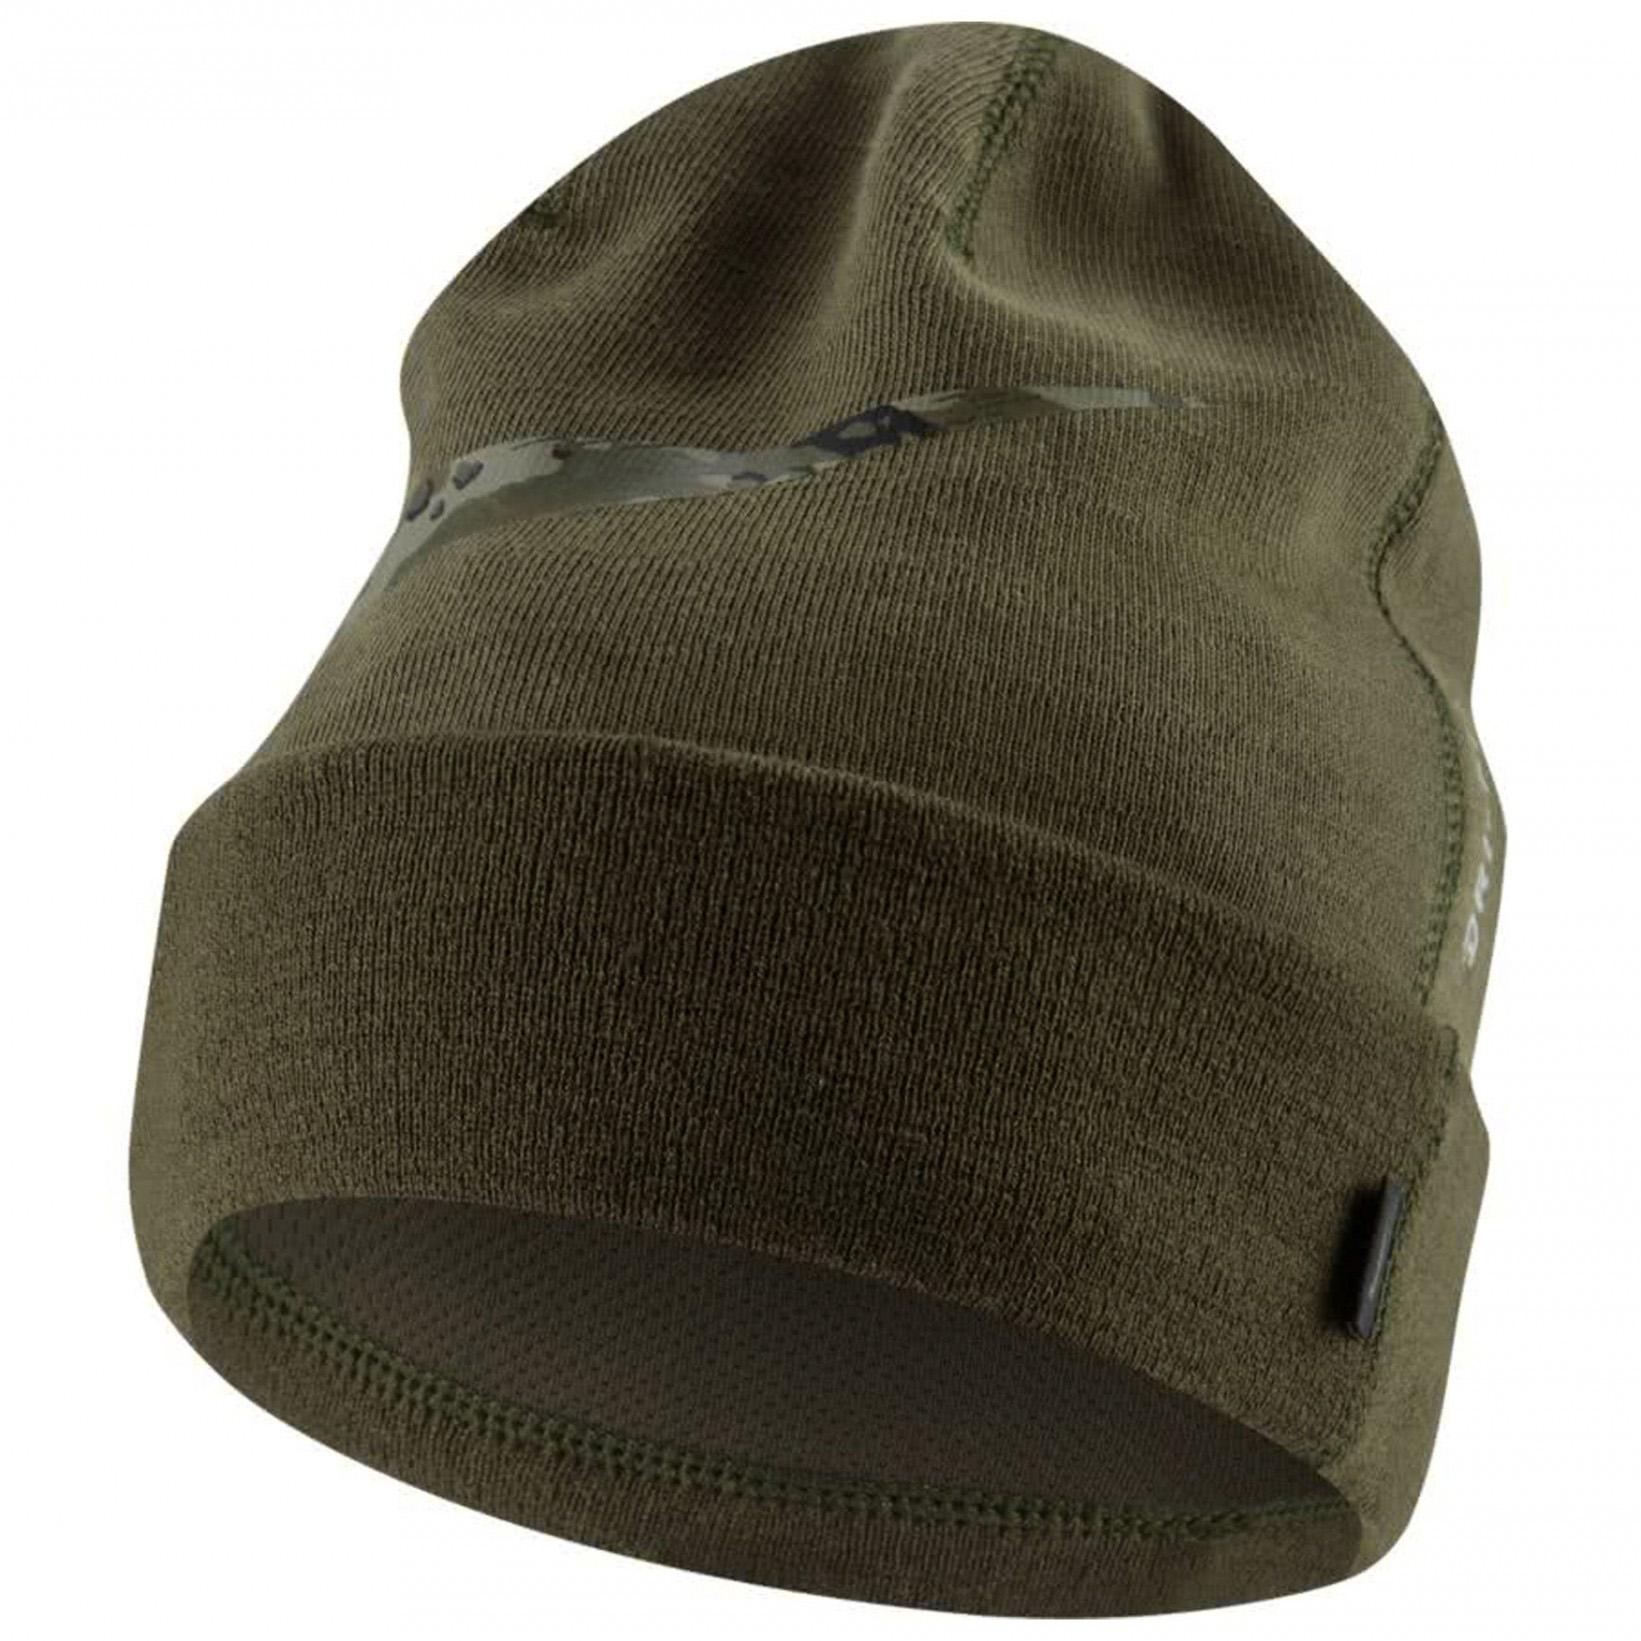 0ba62ac2b8a Nike Swoosh Cuffed Beanie - SPORTING GOODS Caps And Hats - Superfanas.lt